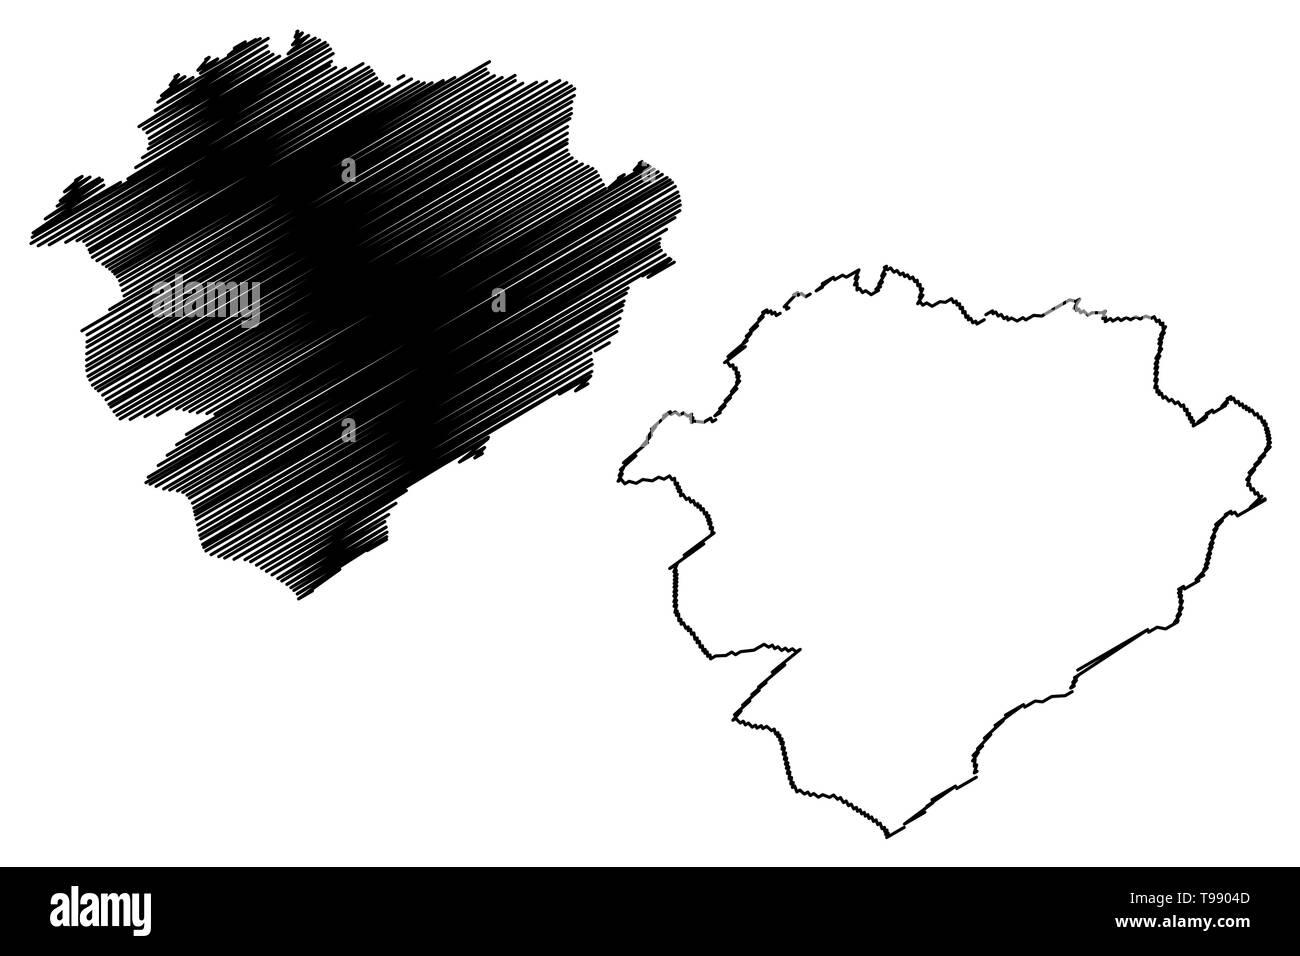 Tiaret Province (Provinces of Algeria, Peoples Democratic Republic of Algeria) map vector illustration, scribble sketch Tiaret map - Stock Image